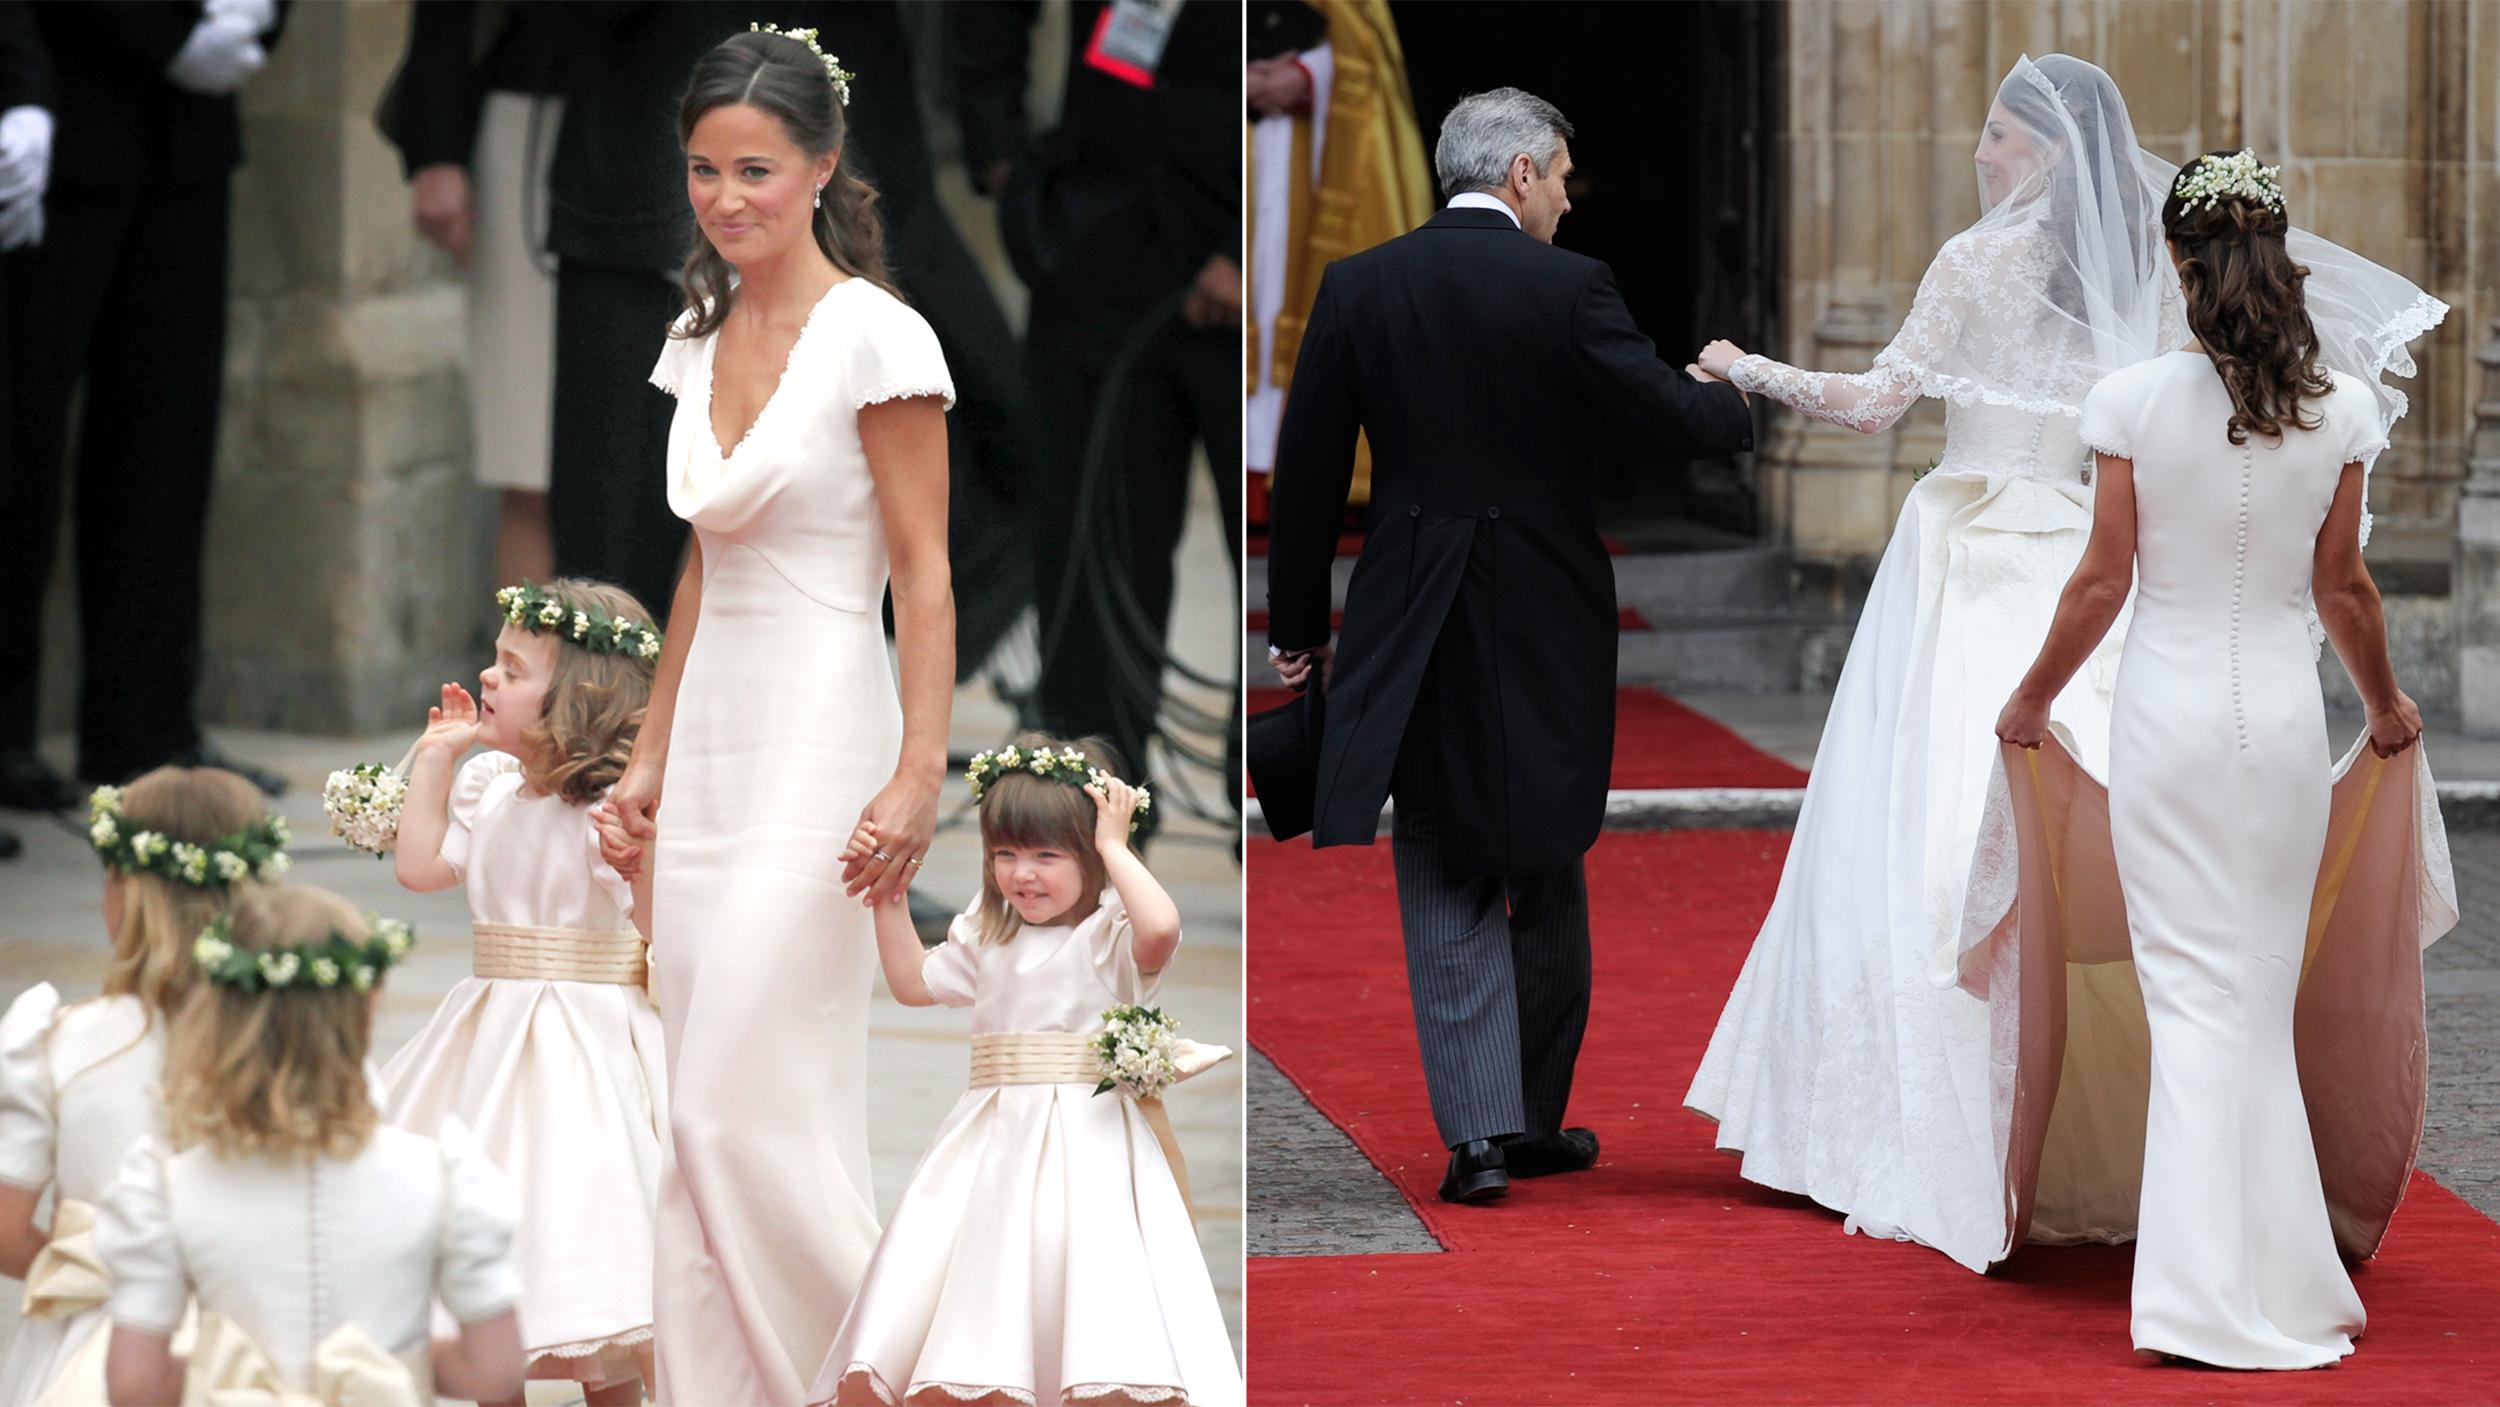 Royal wedding pippa middleton dress : Pippa middleton royal wedding dress fitted a little too today